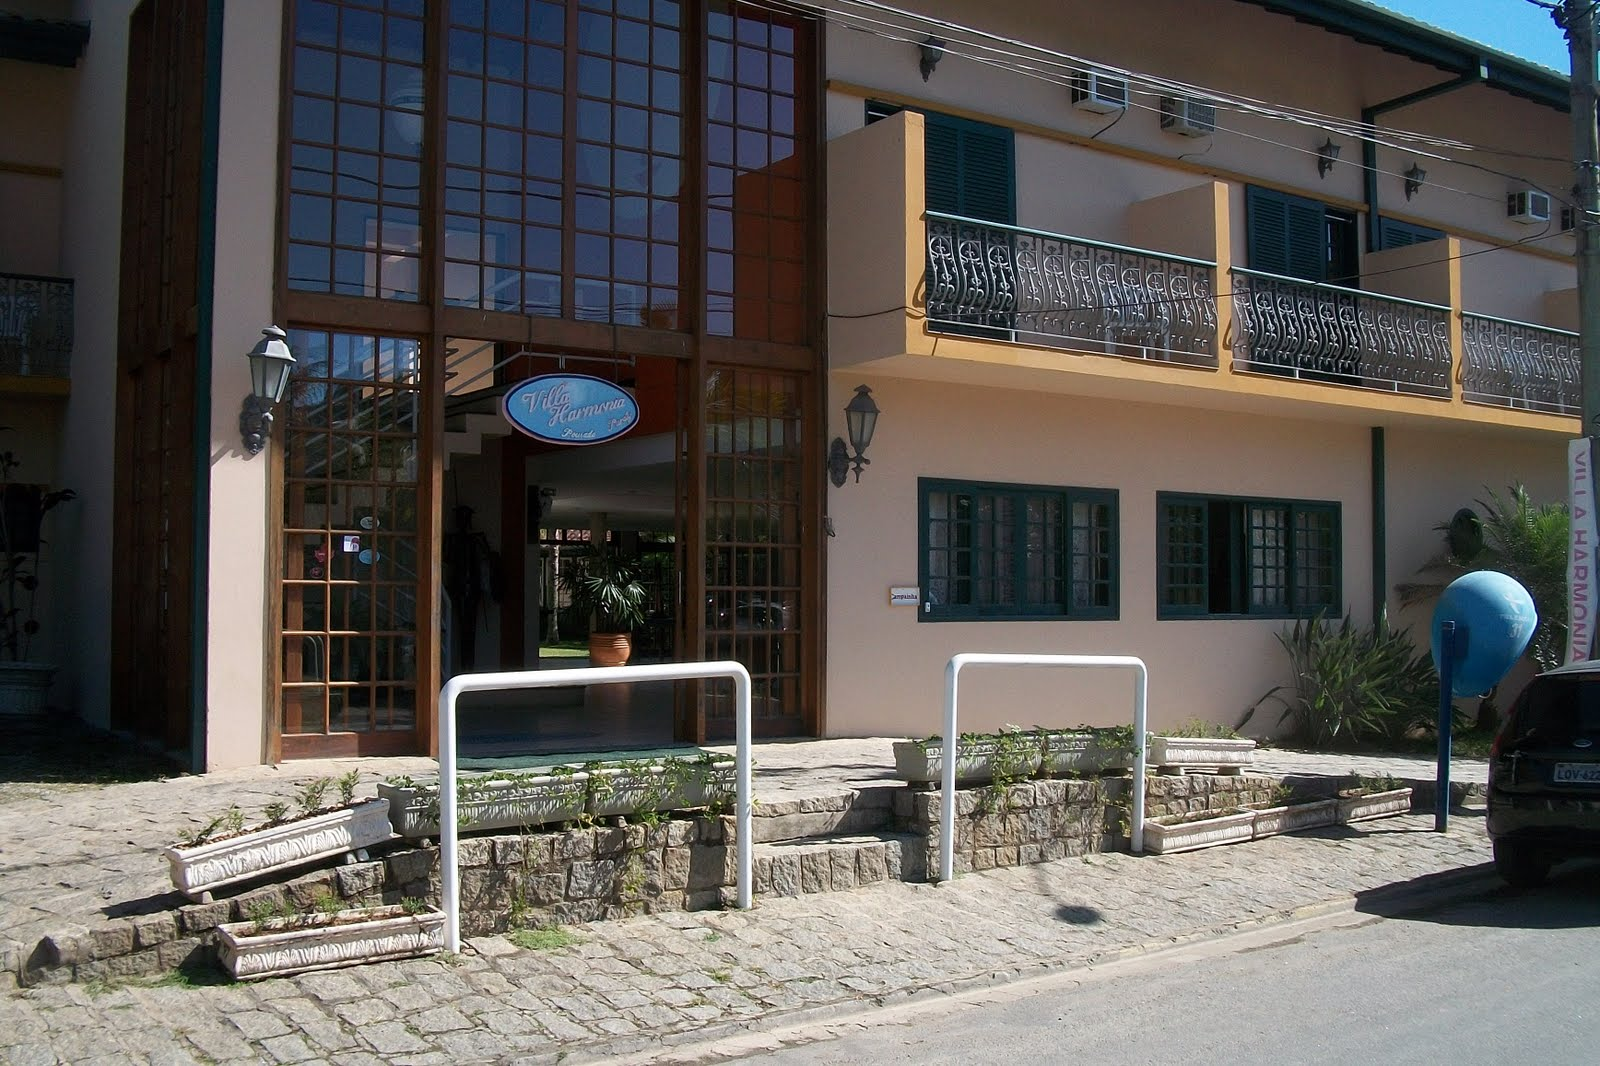 VIAJANTE ESPECIAL: Pousada Villa Harmonia Paraty RJ #41738A 1600x1066 Banheiro Adaptado Restaurante